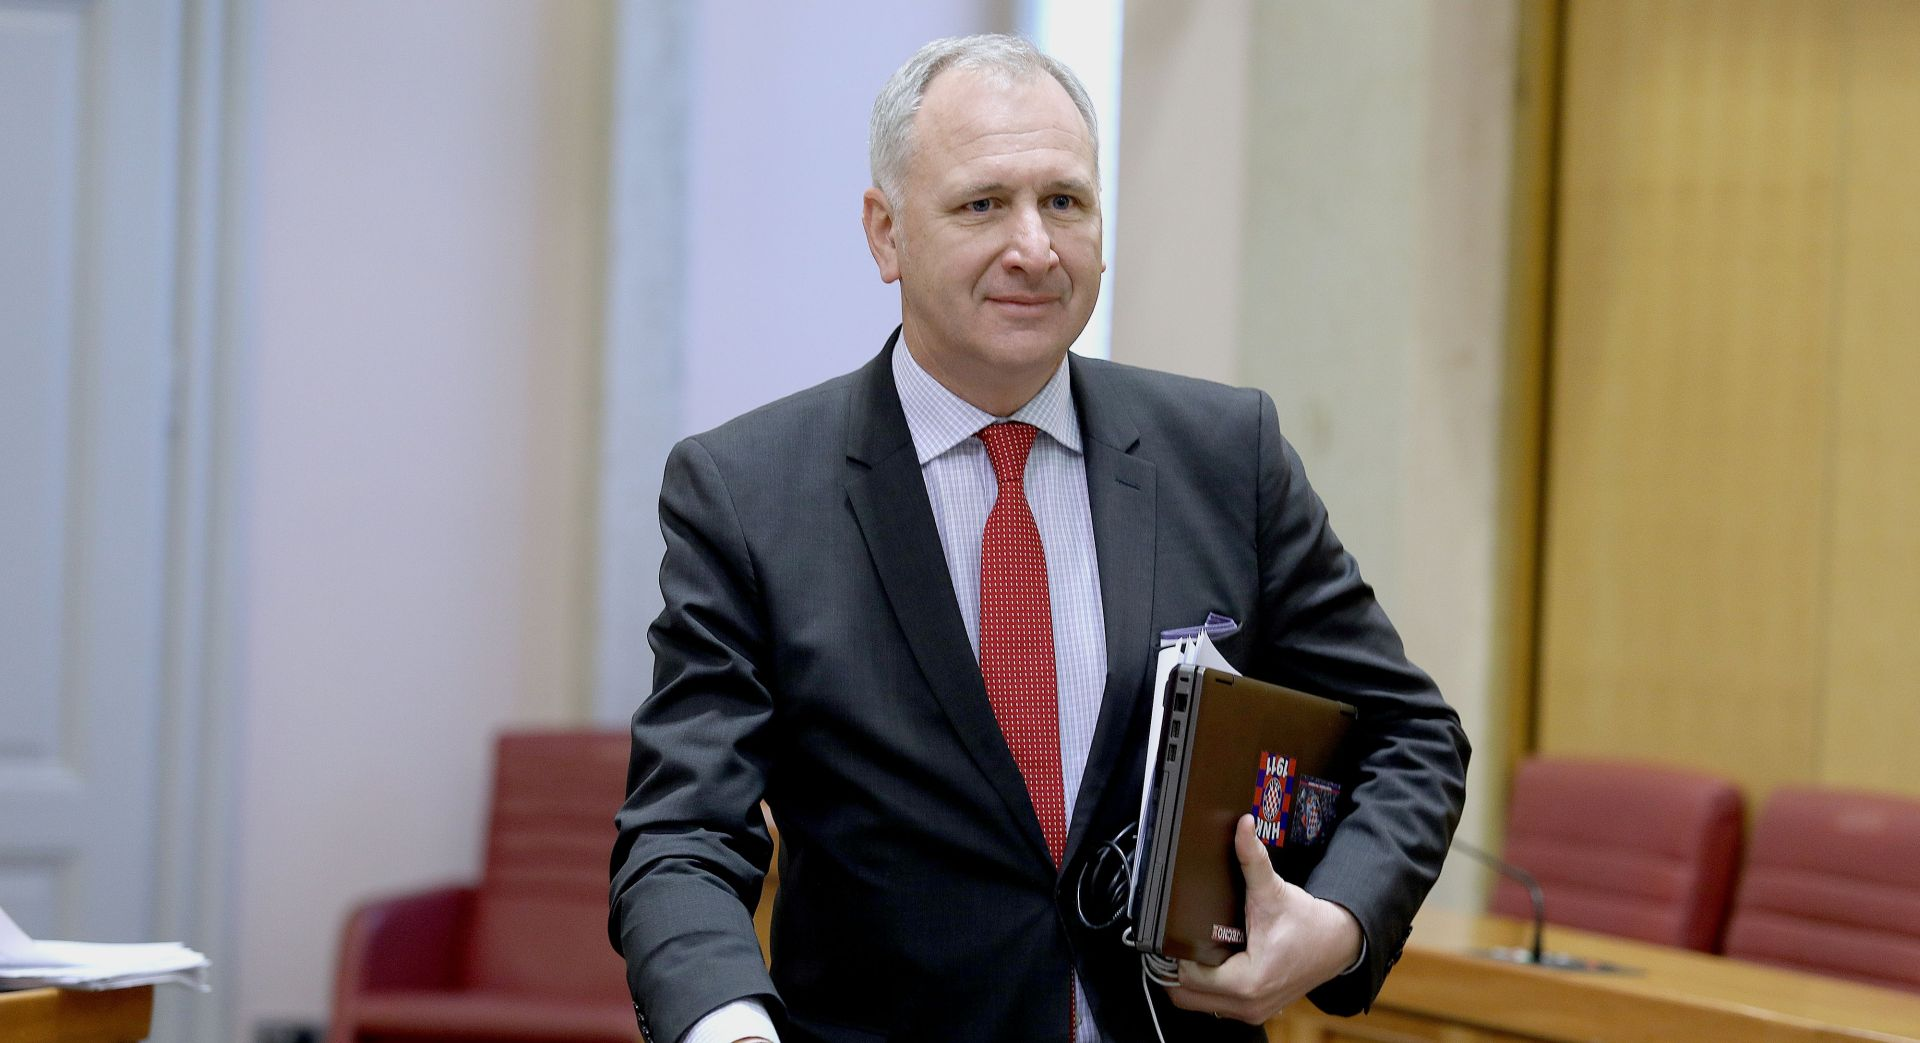 Splitski gradonačelnik razgovarao s ministrom Ćorićem o sanaciji Karepovca